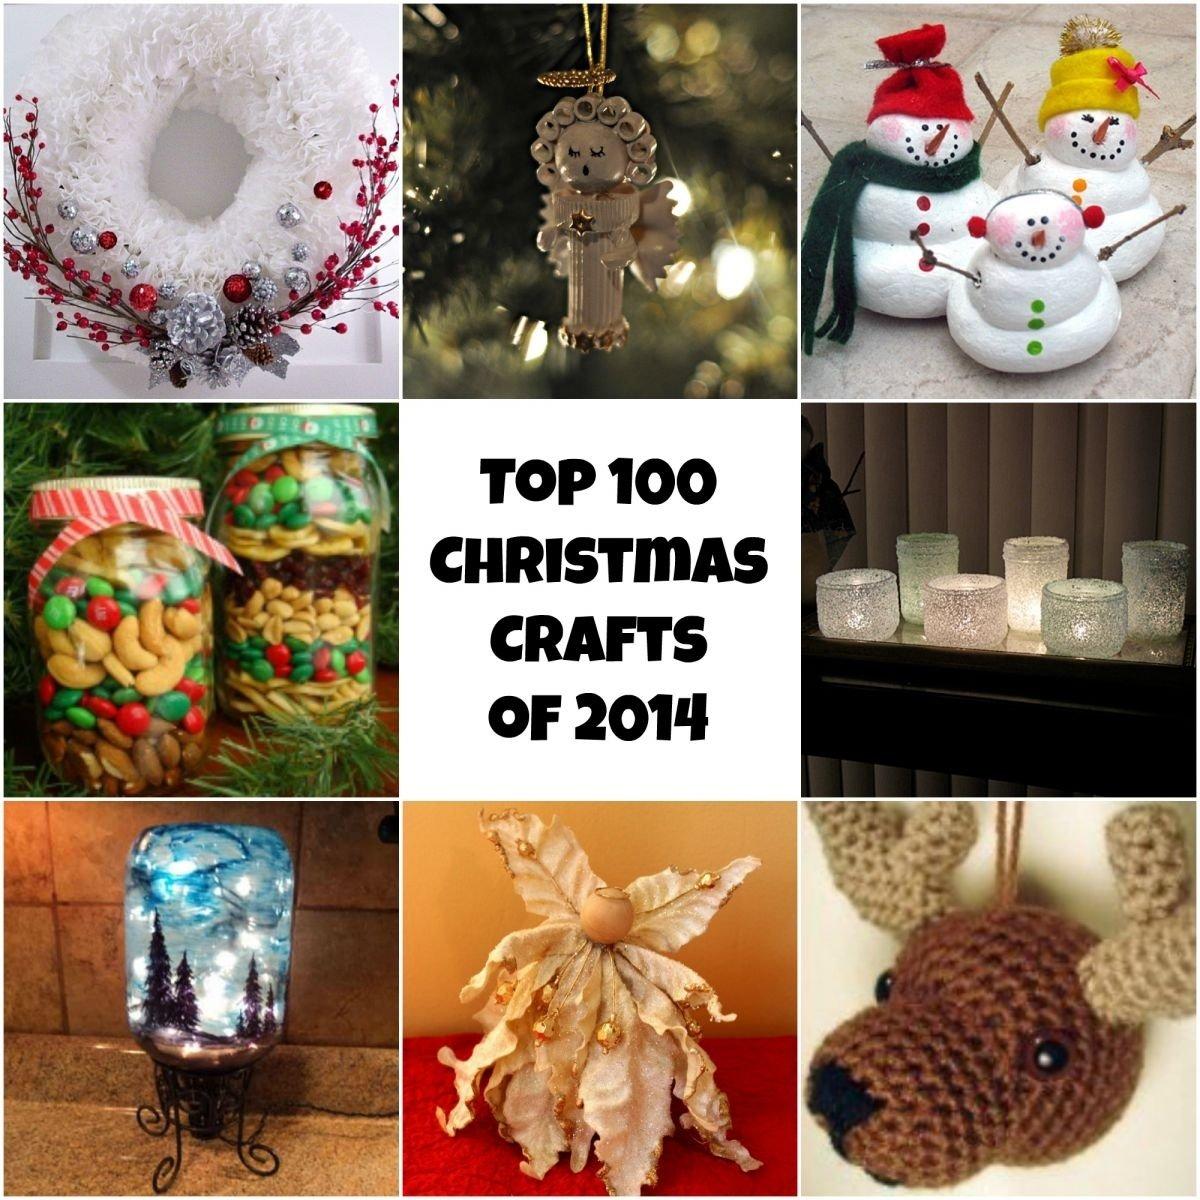 top 100 diy christmas crafts of 2014: homemade christmas ornaments